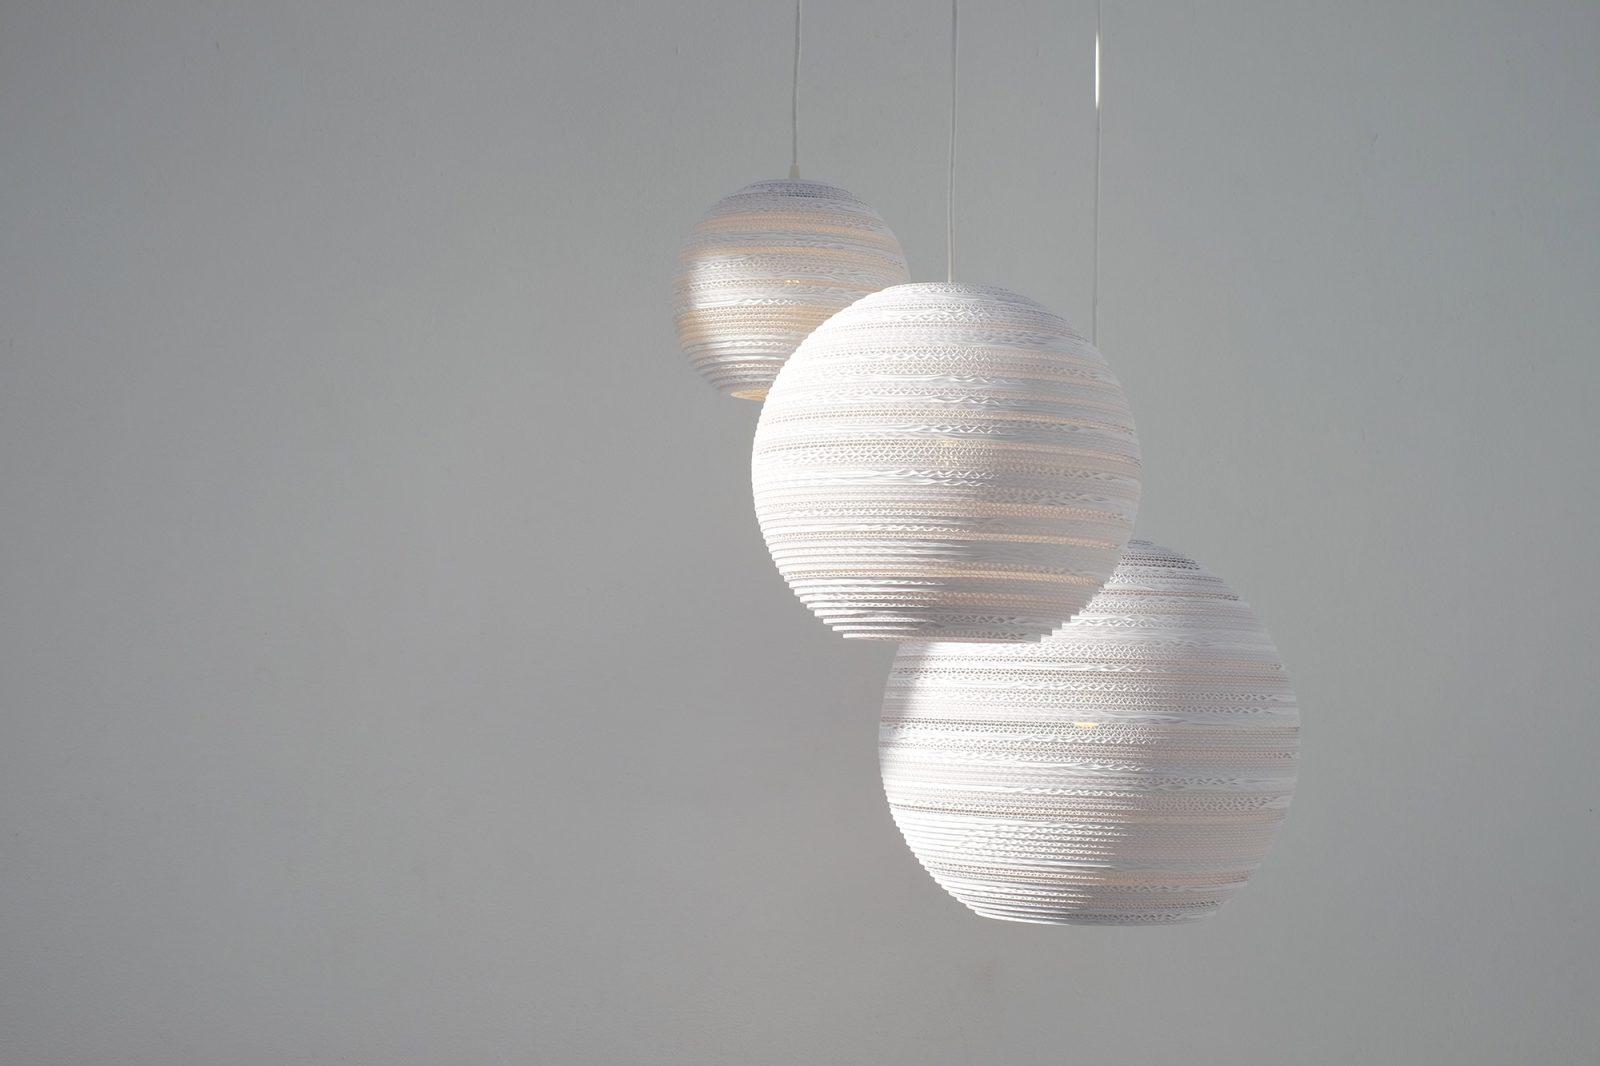 Moon 14 Scraplight White Pendant Light-31534